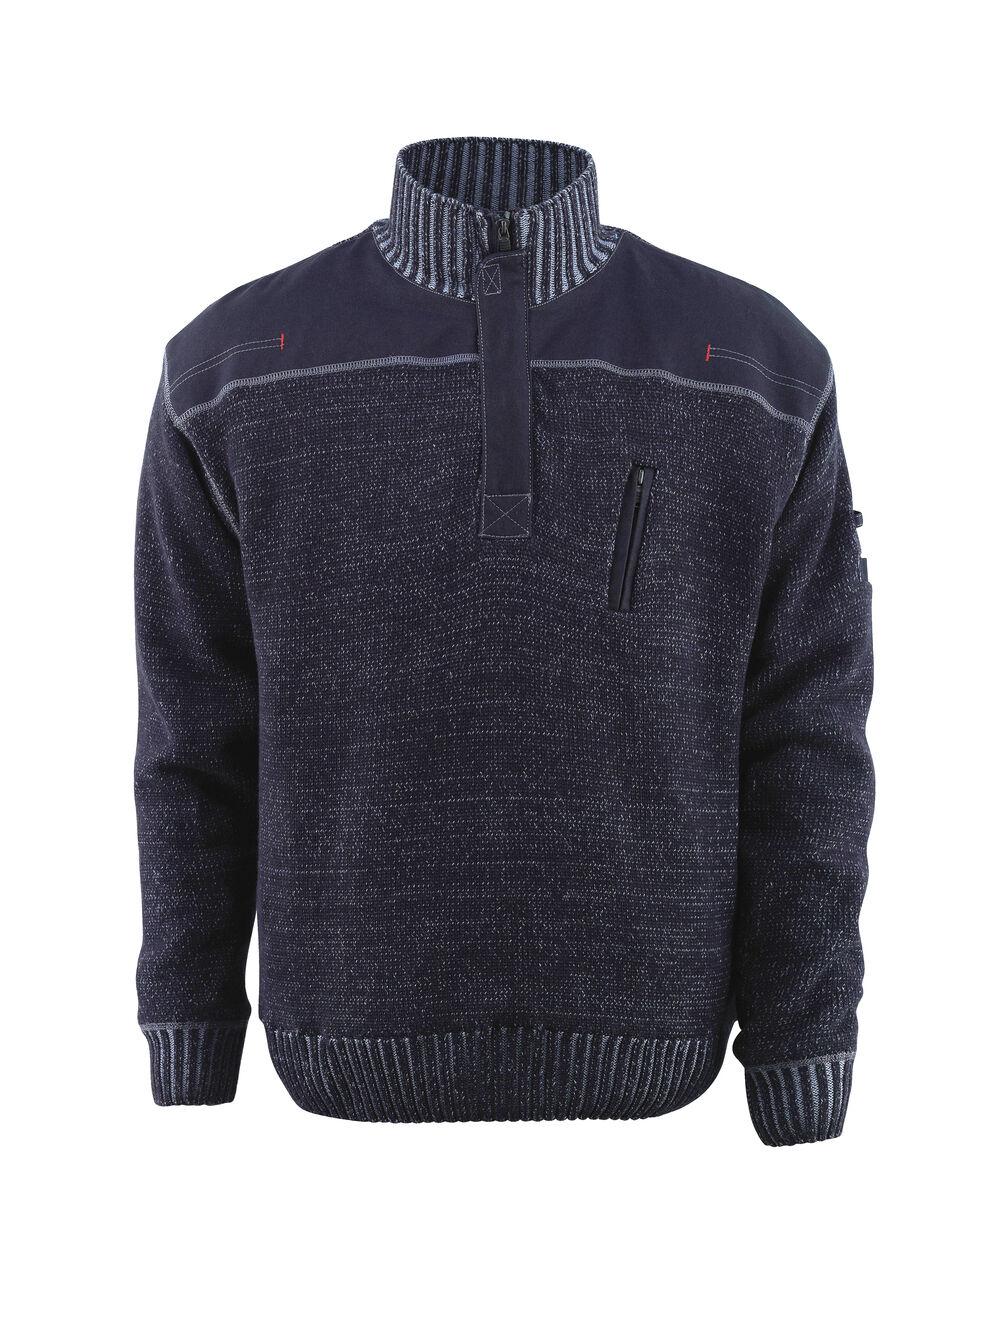 Mascot Naxos Knitted Jumper Workwear schweißhemds Blau grau Snickers Direct Pre